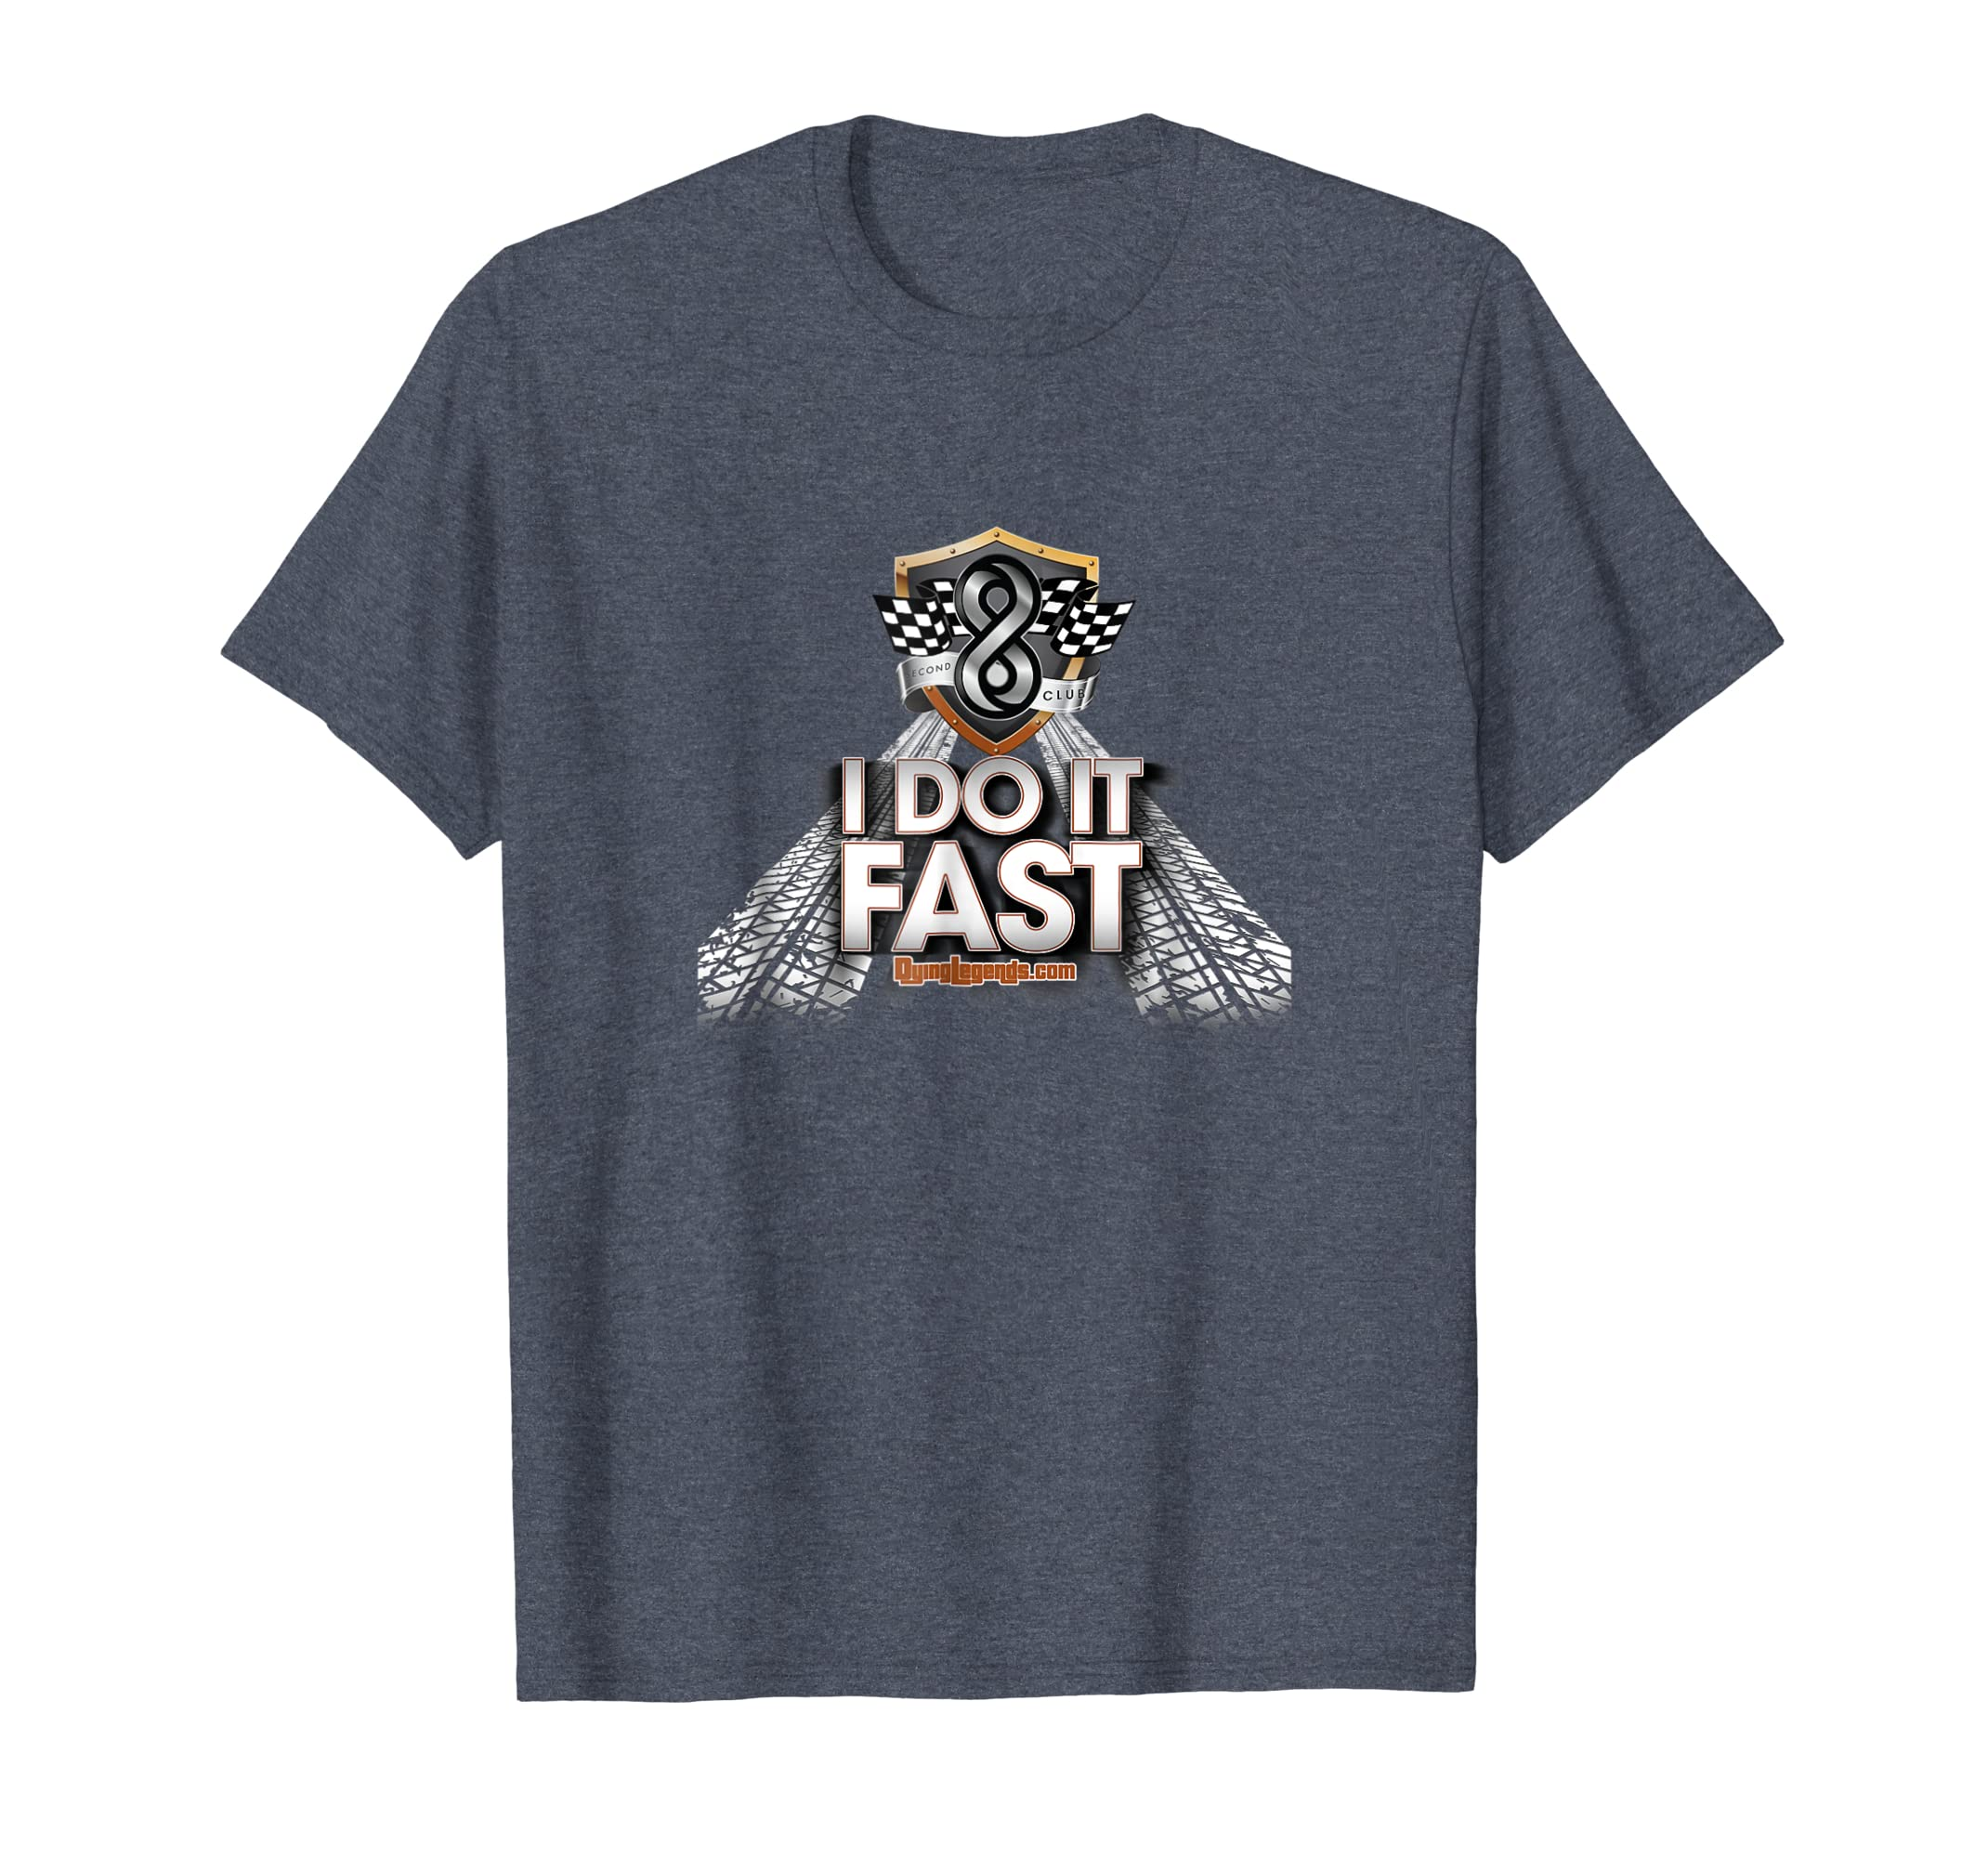 Amazon com: I Do It Fast! 8 Second Club: Clothing